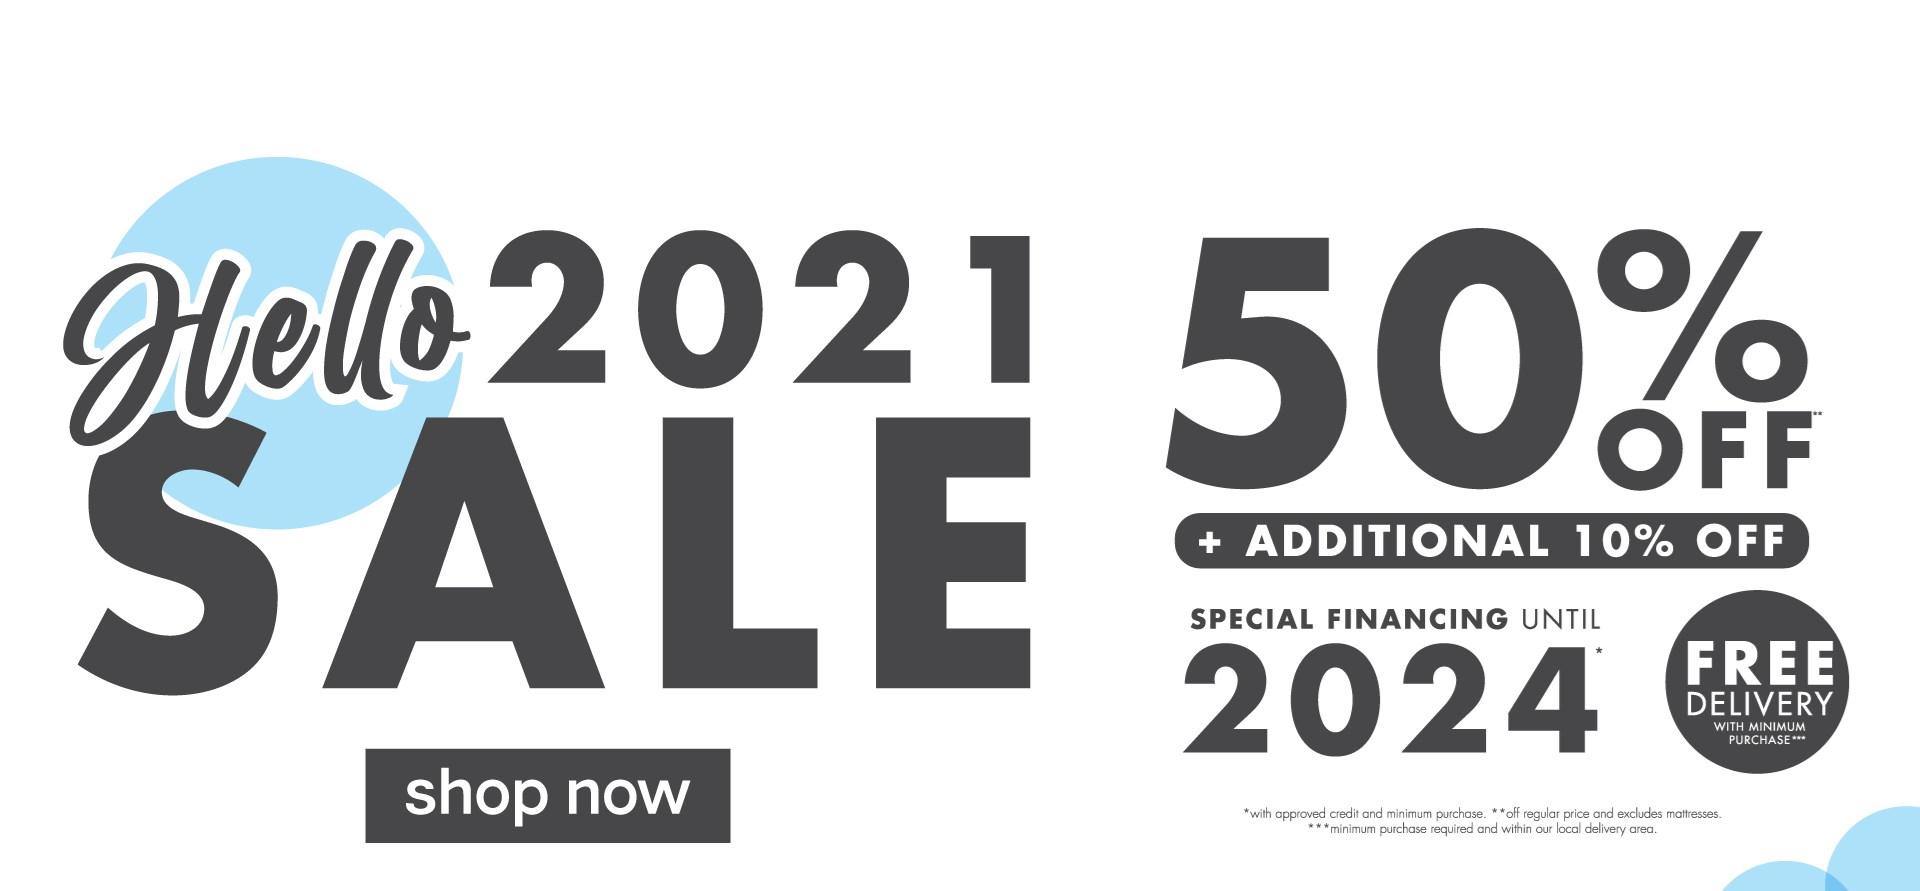 Hello 2021 Sale